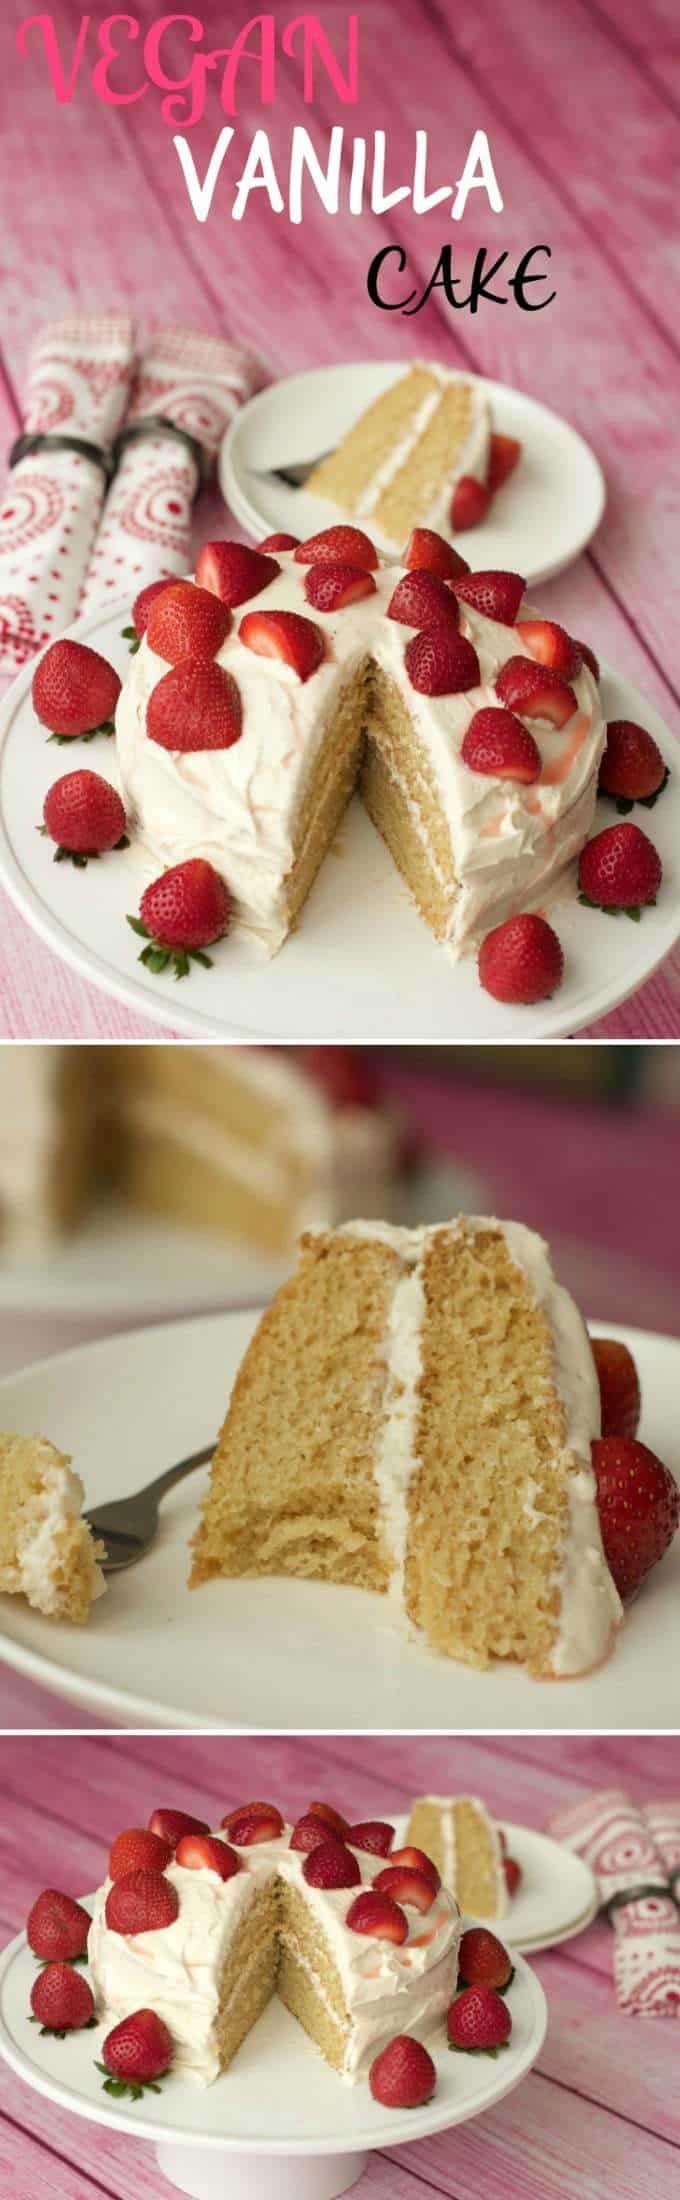 Vegan Vanilla Cake - Light, fluffy and dreamy! Vegan   dairy-free   Vegan Cakes   Vegan Desserts   Vegan Food   Vegan Recipes